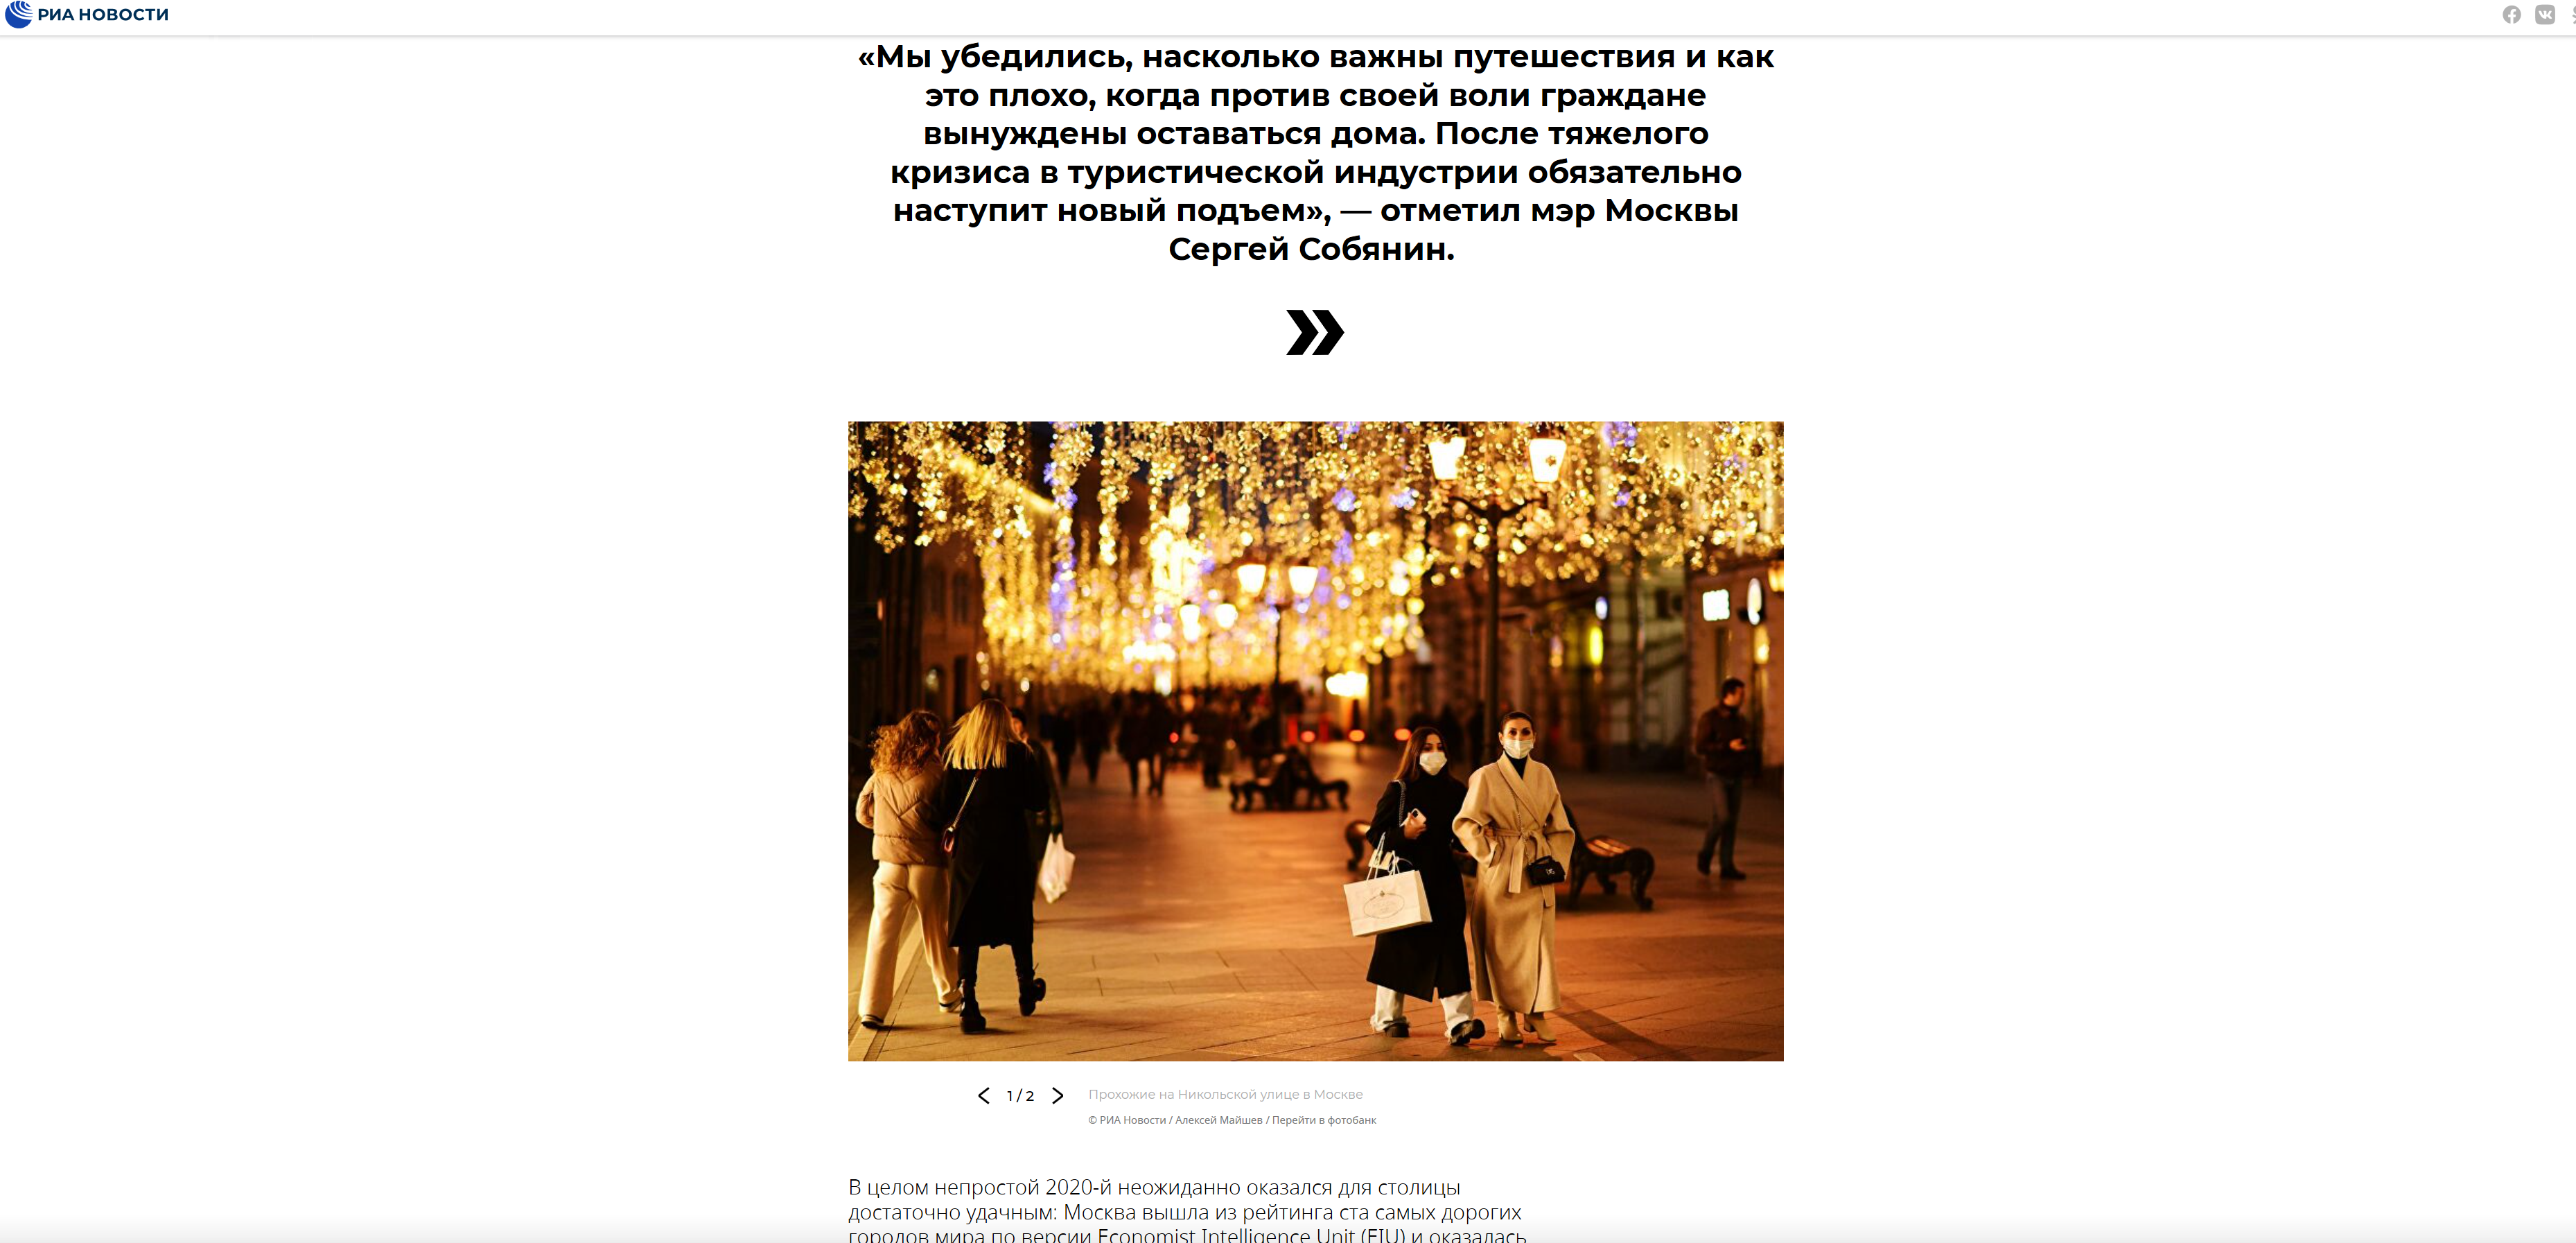 РИА-Новости, www.ria.ru, 02.12.2020